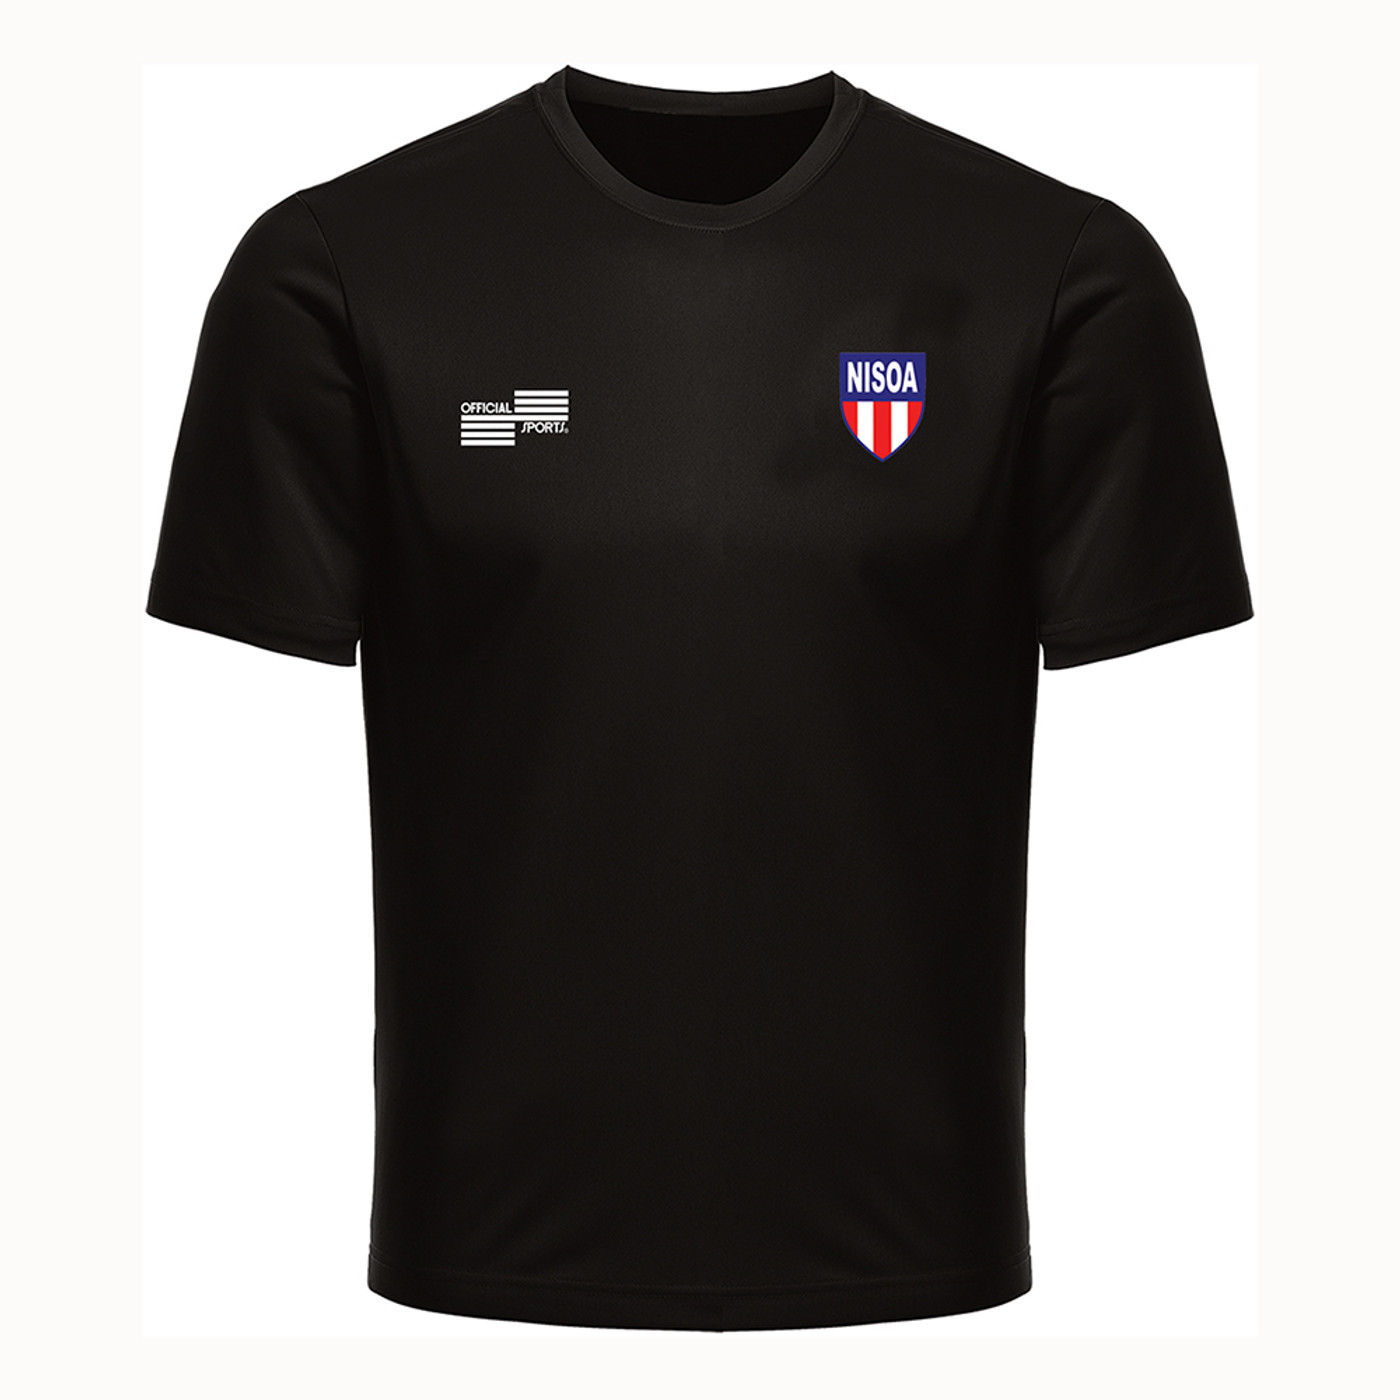 2244N NISOA Wicking Short Sleeve T-Shirt